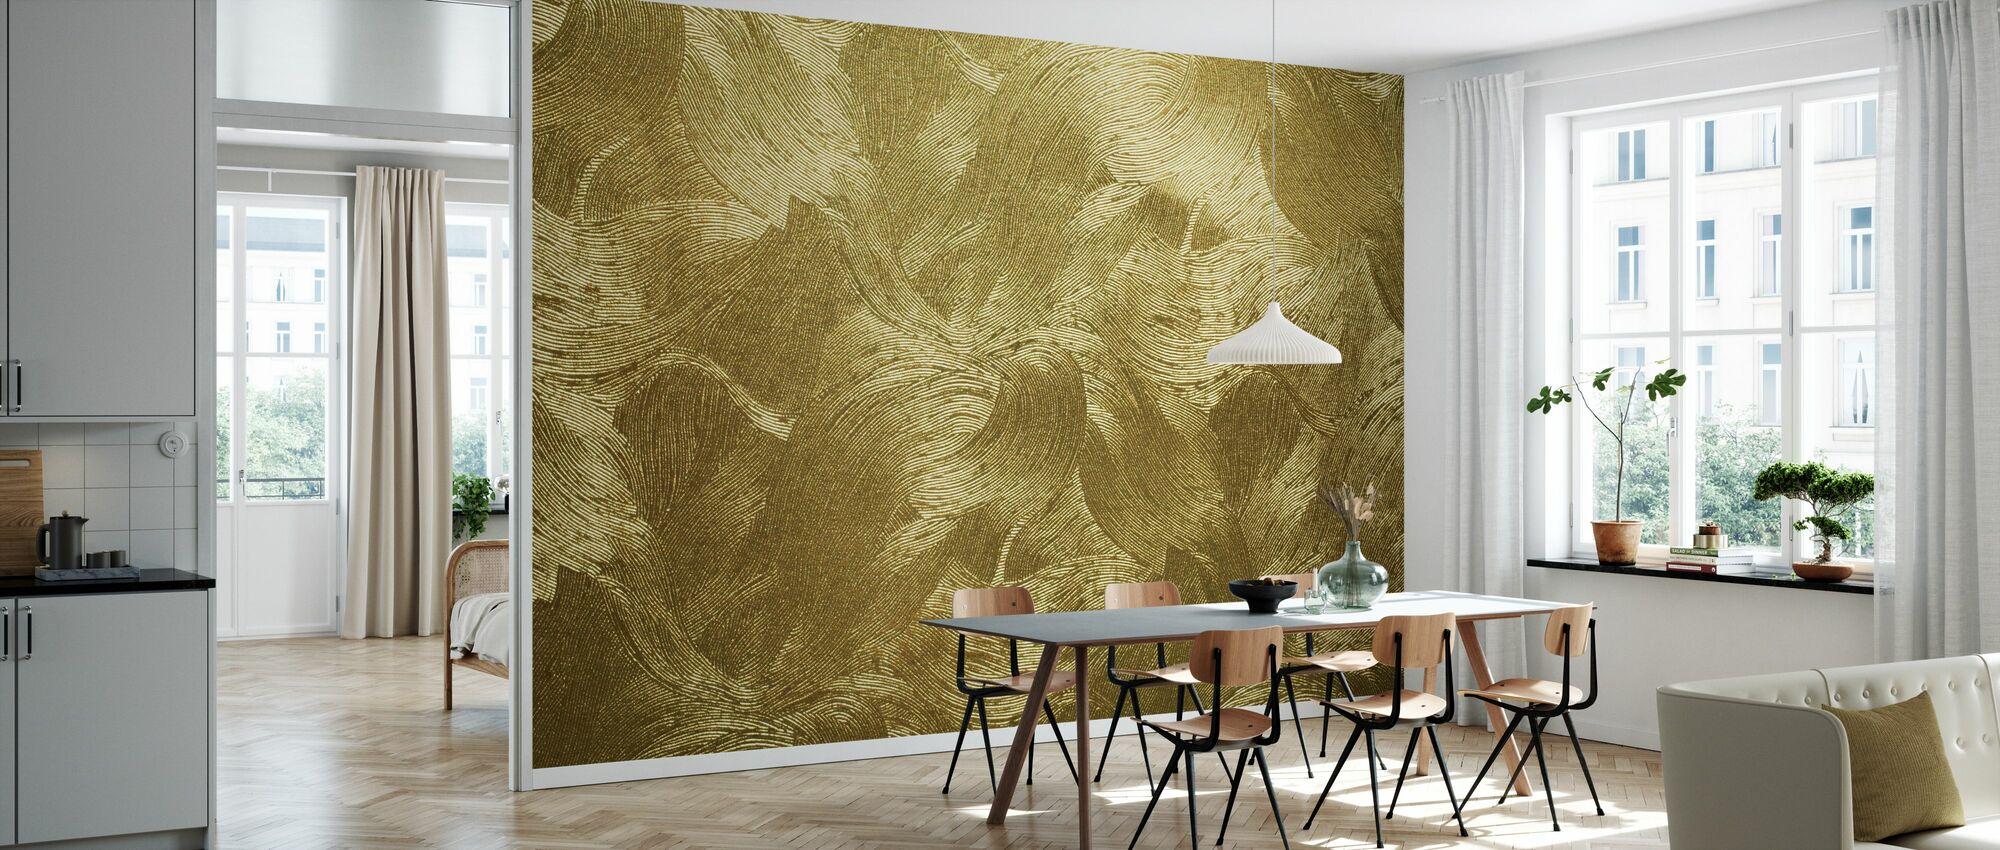 Golden Washi Paper - Wallpaper - Kitchen